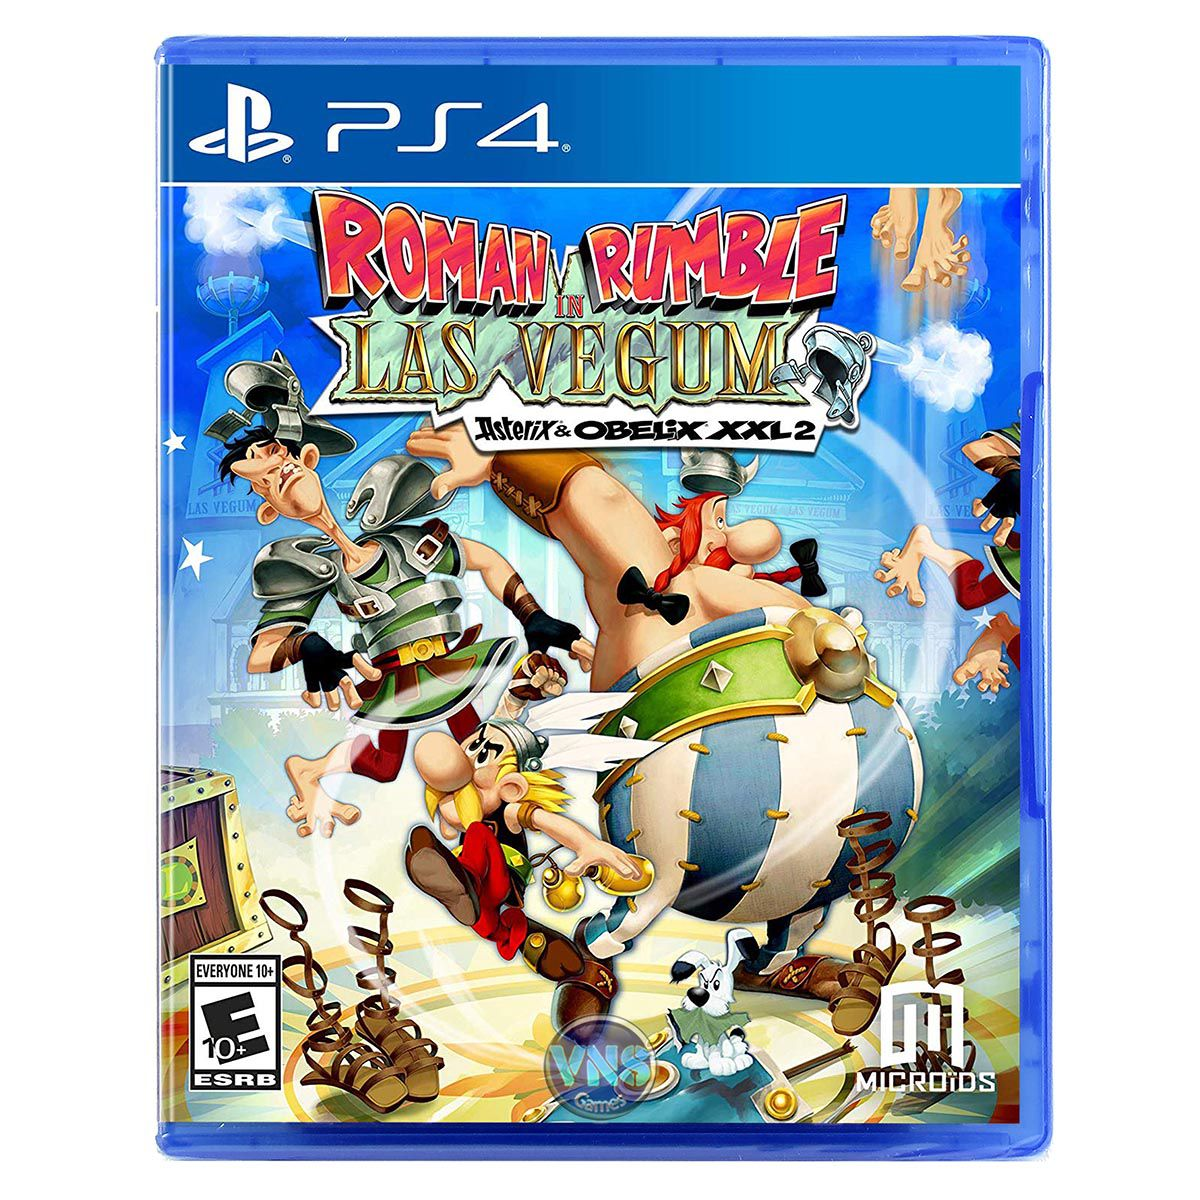 Roman Rumble in Las Vegum - Asterix and Obelix XXL 2 - PS4